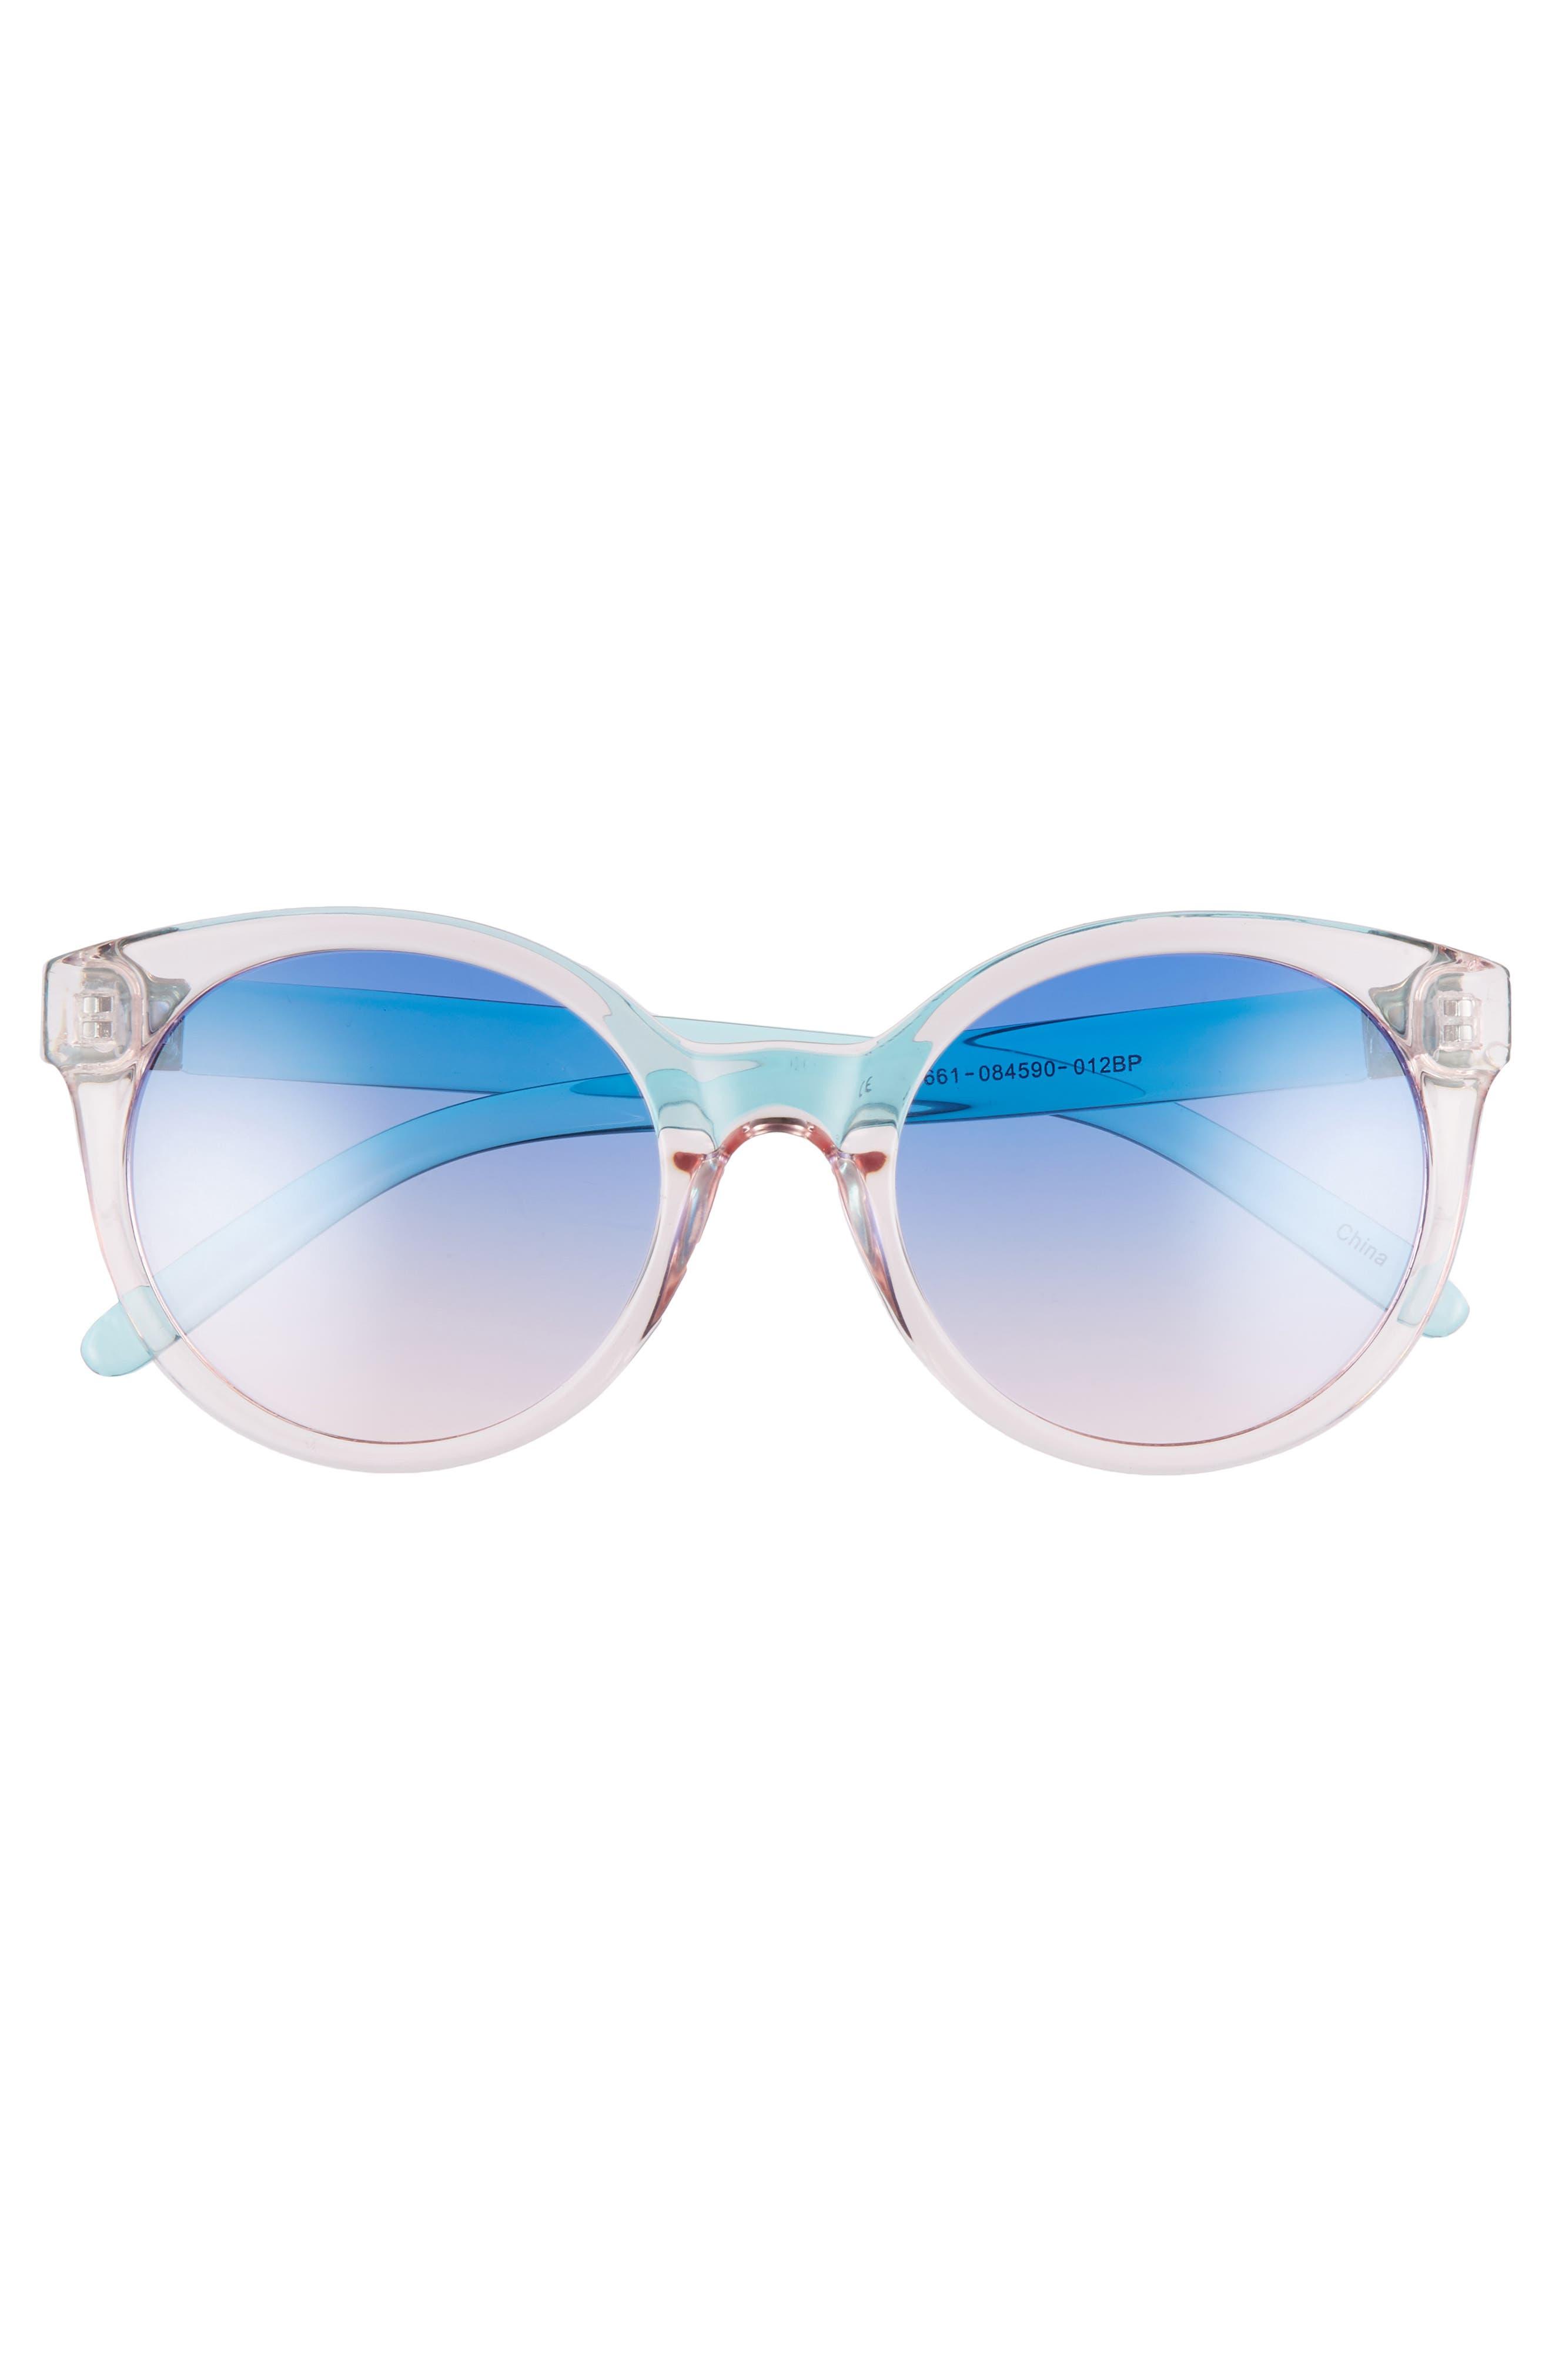 Transparent Round Sunglasses,                             Alternate thumbnail 3, color,                             Multi